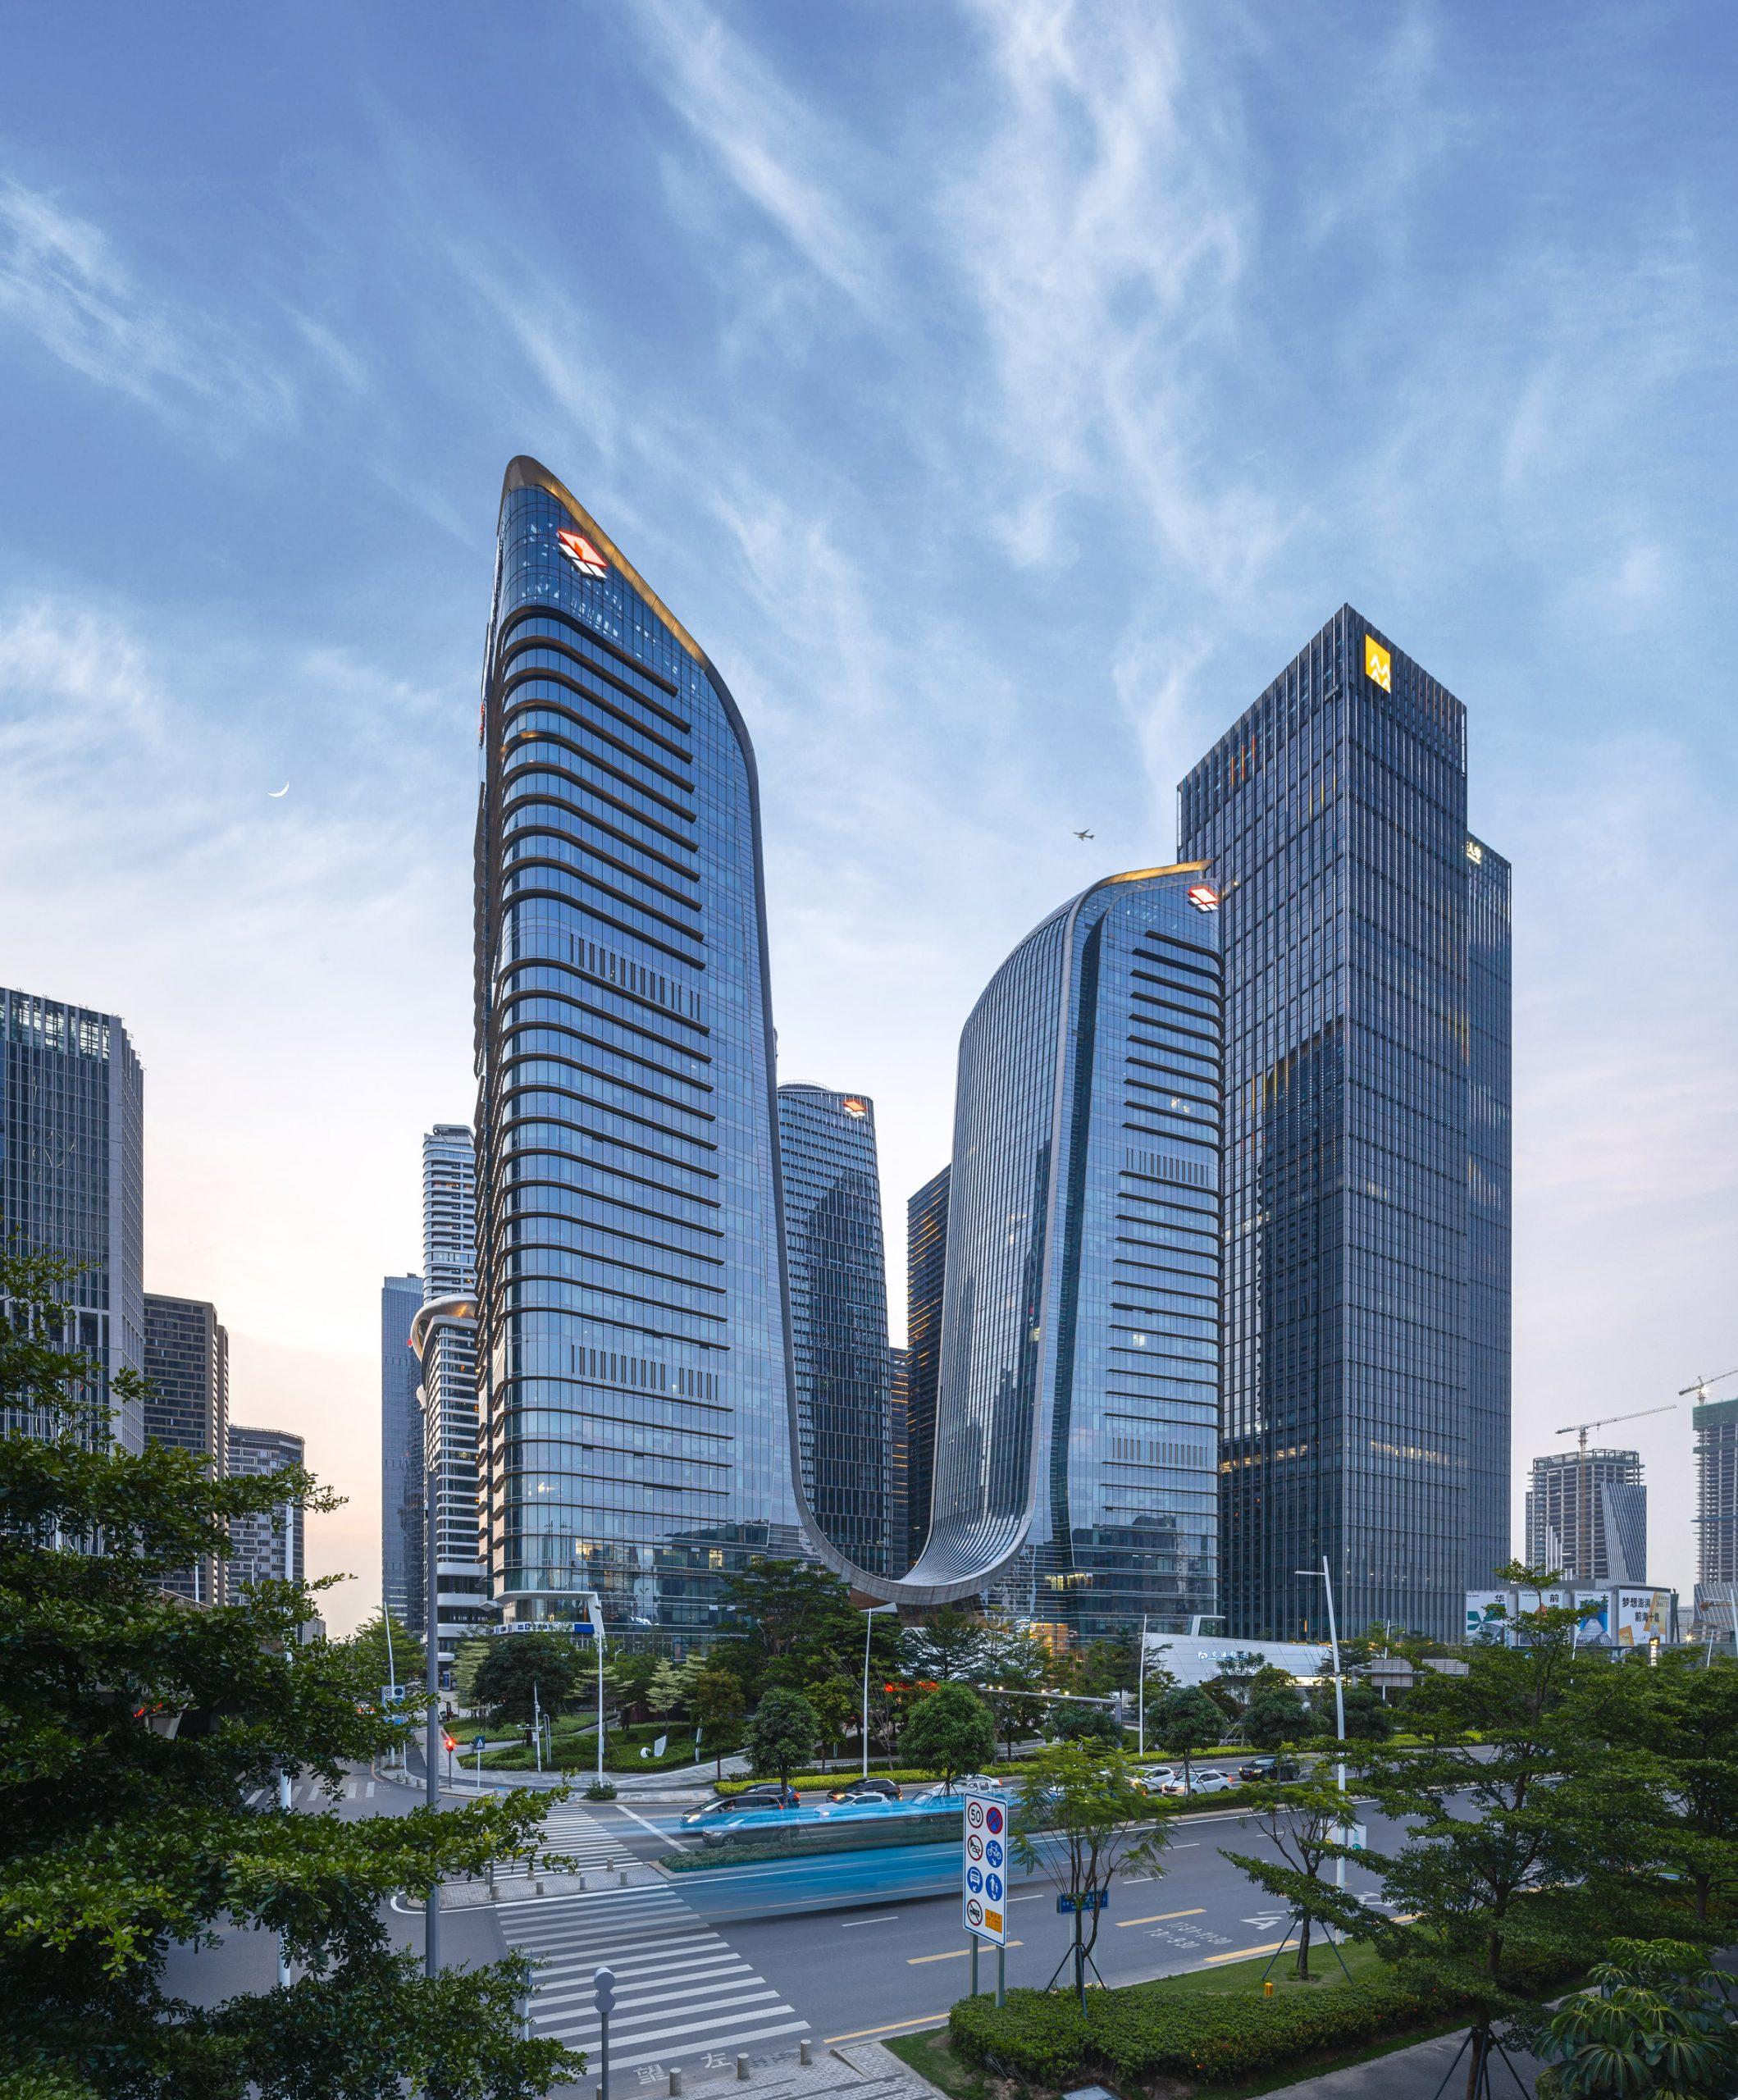 farrells-shenzhen-six-skyscrapers-china-qianhai-district_dezeen_2364_col_9-scaled.jpg